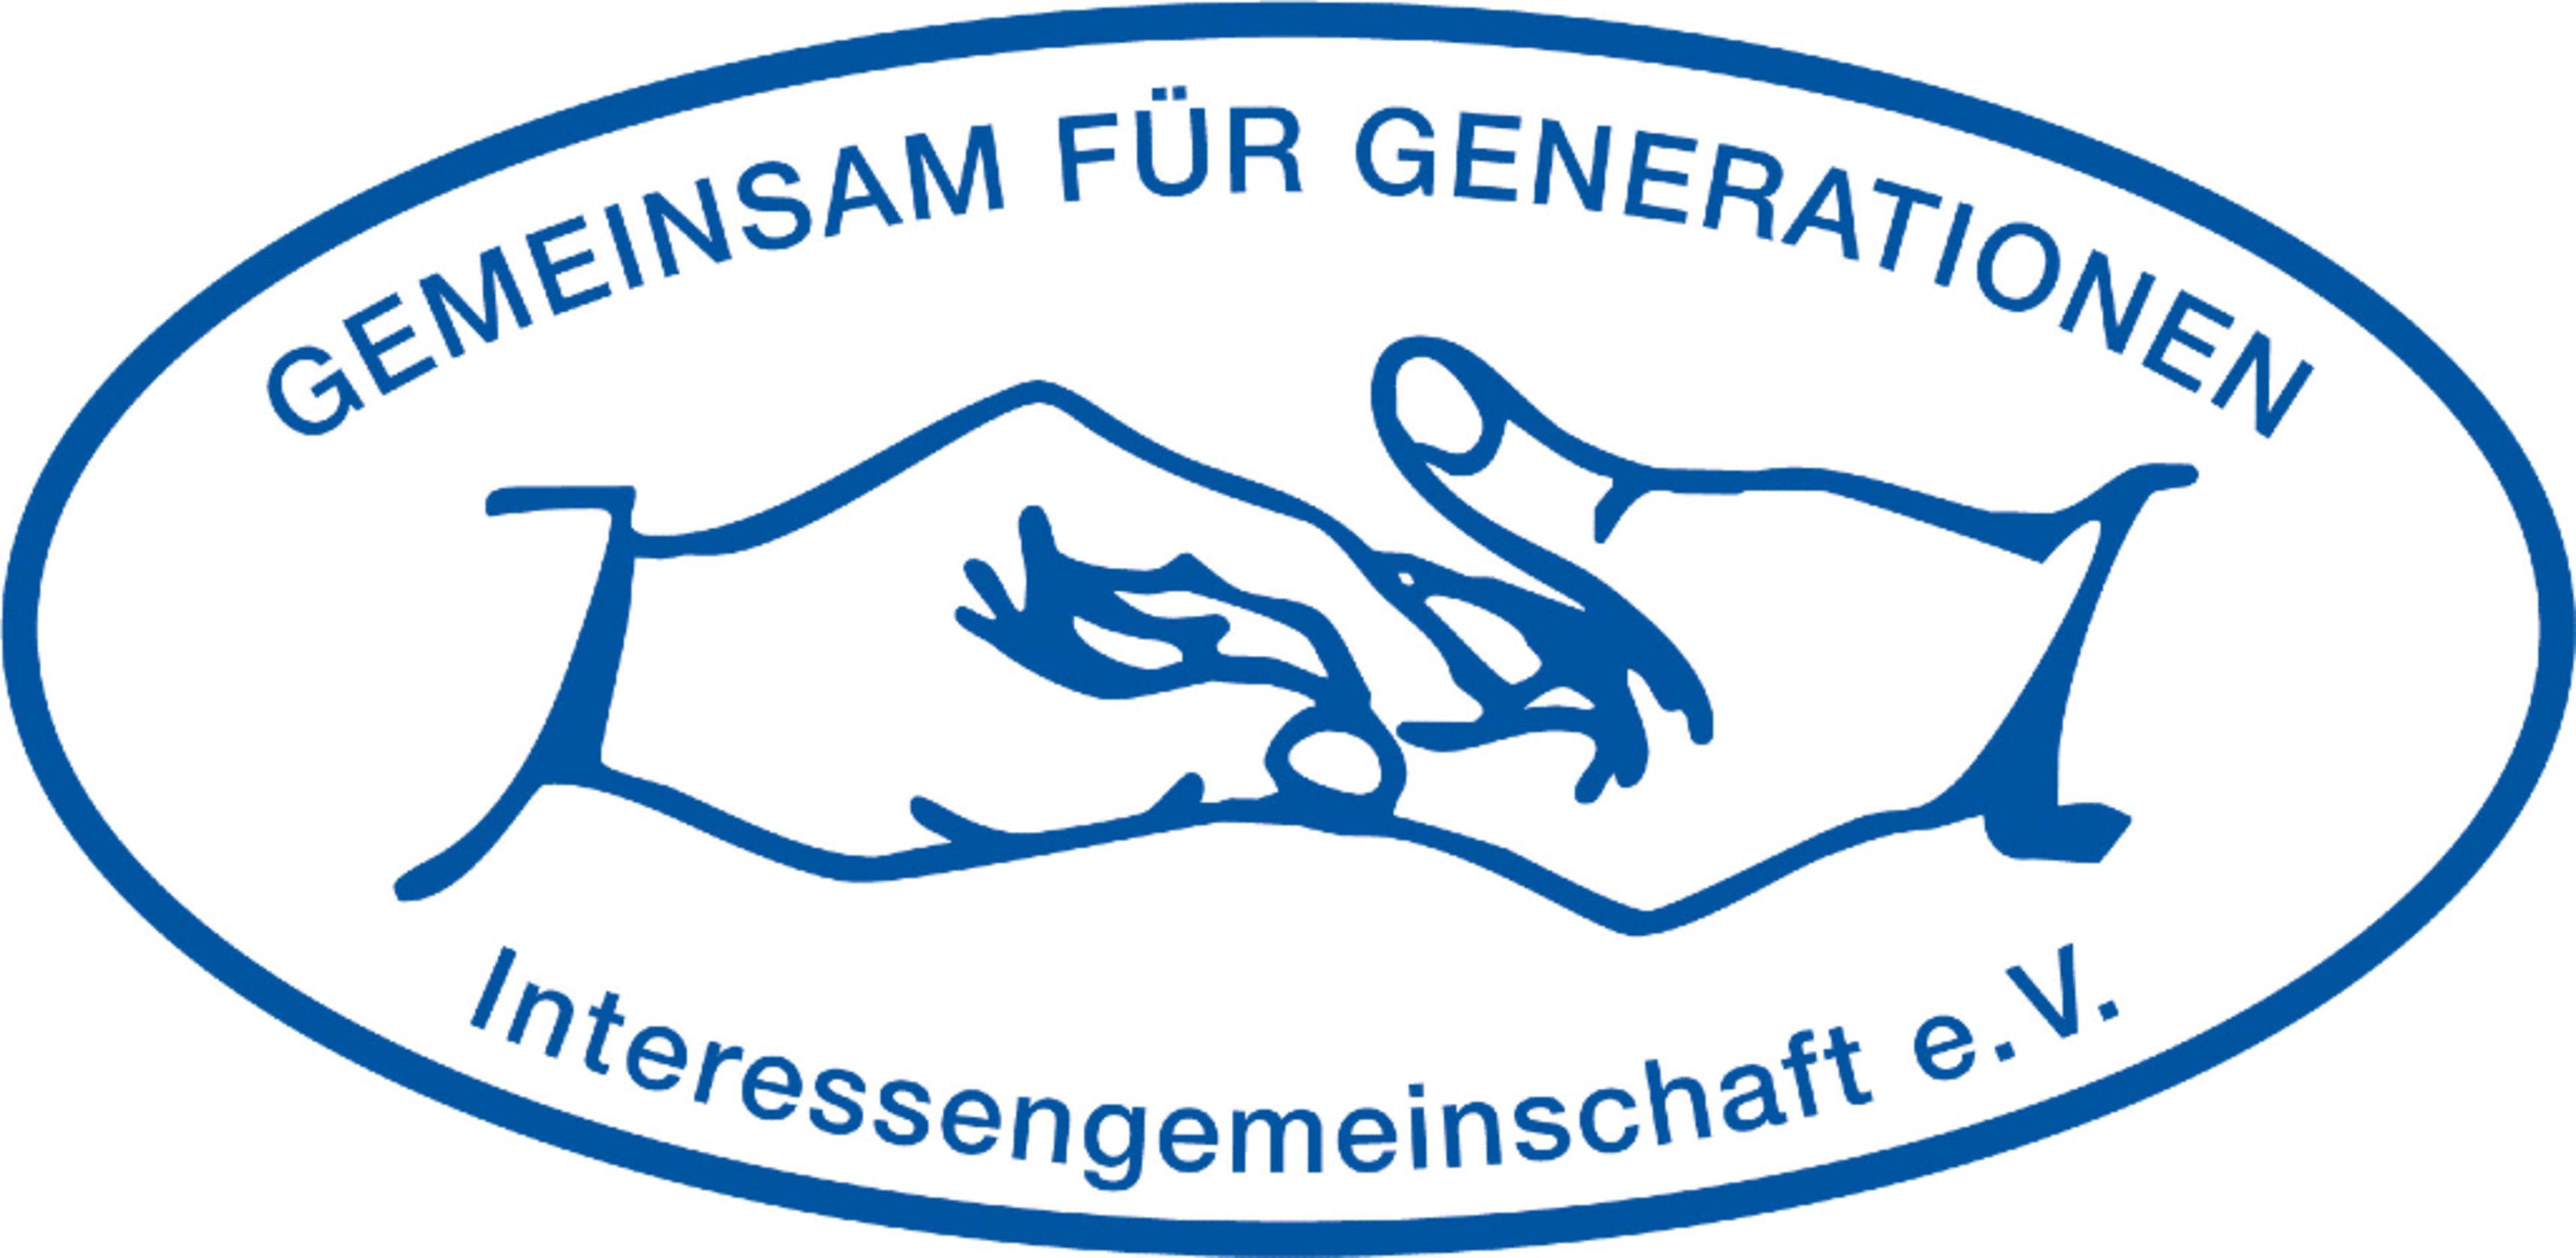 logo Interessengemeinschaft e.V. (InGe)